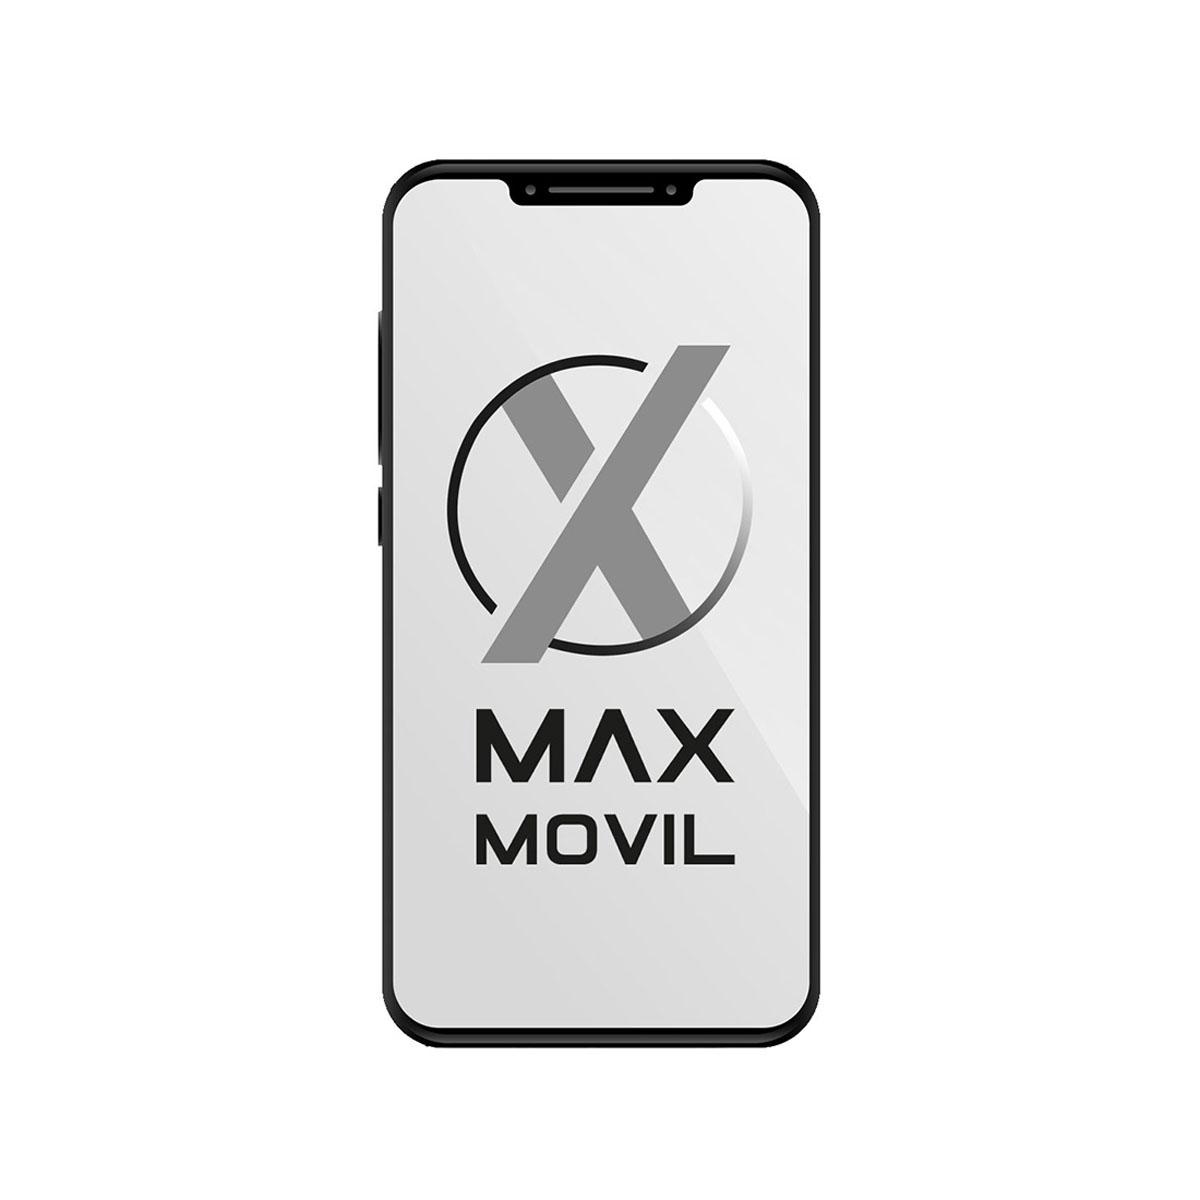 Motorola Moto Z2 Play 32 GB Gris Dual SIM XT1710-09